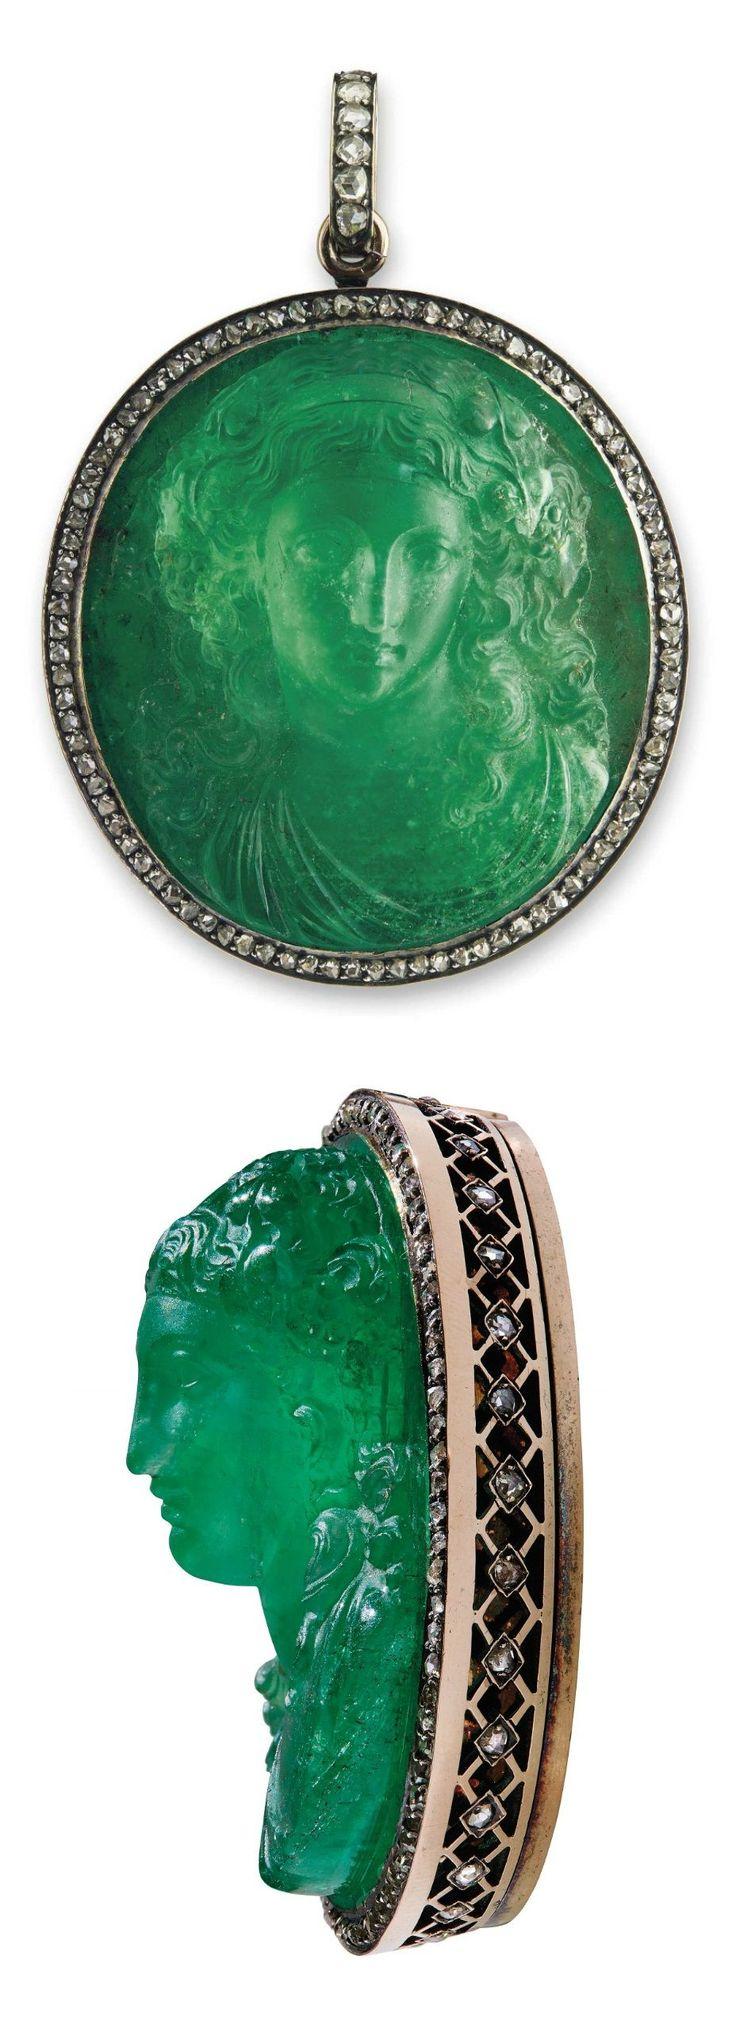 HISTORIC EMERALD AND DIAMOND PENDANT. The emerald cameo in high relief depicting a female bust within a rose-cut diamond surround and detachable pendant hoop, 6.0 cm. Provenance: Lausanne, January 1920, lot 234, Joyaux de Madame la Princesse Lobanoff de Rostoff.